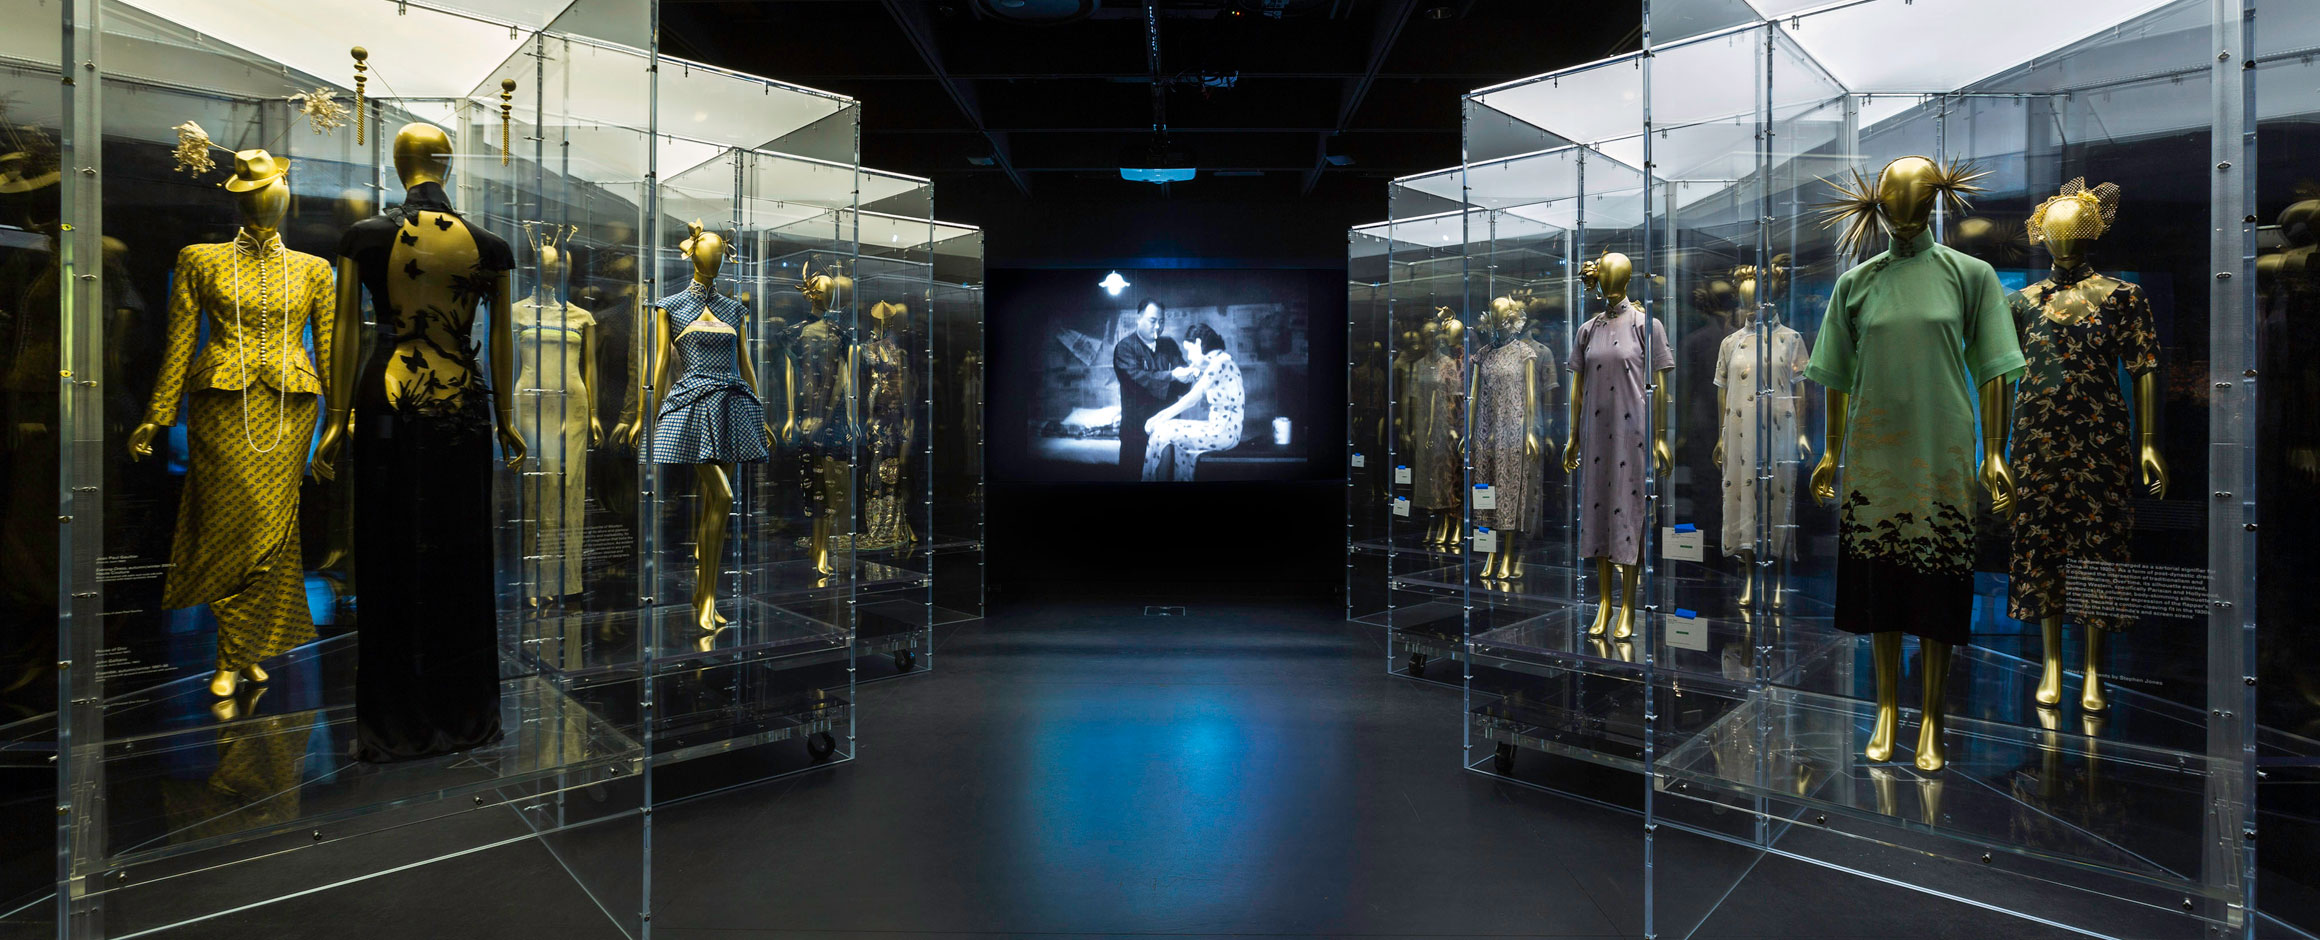 The Metropolitan Museum of Art Costume Institute. Image: The Met